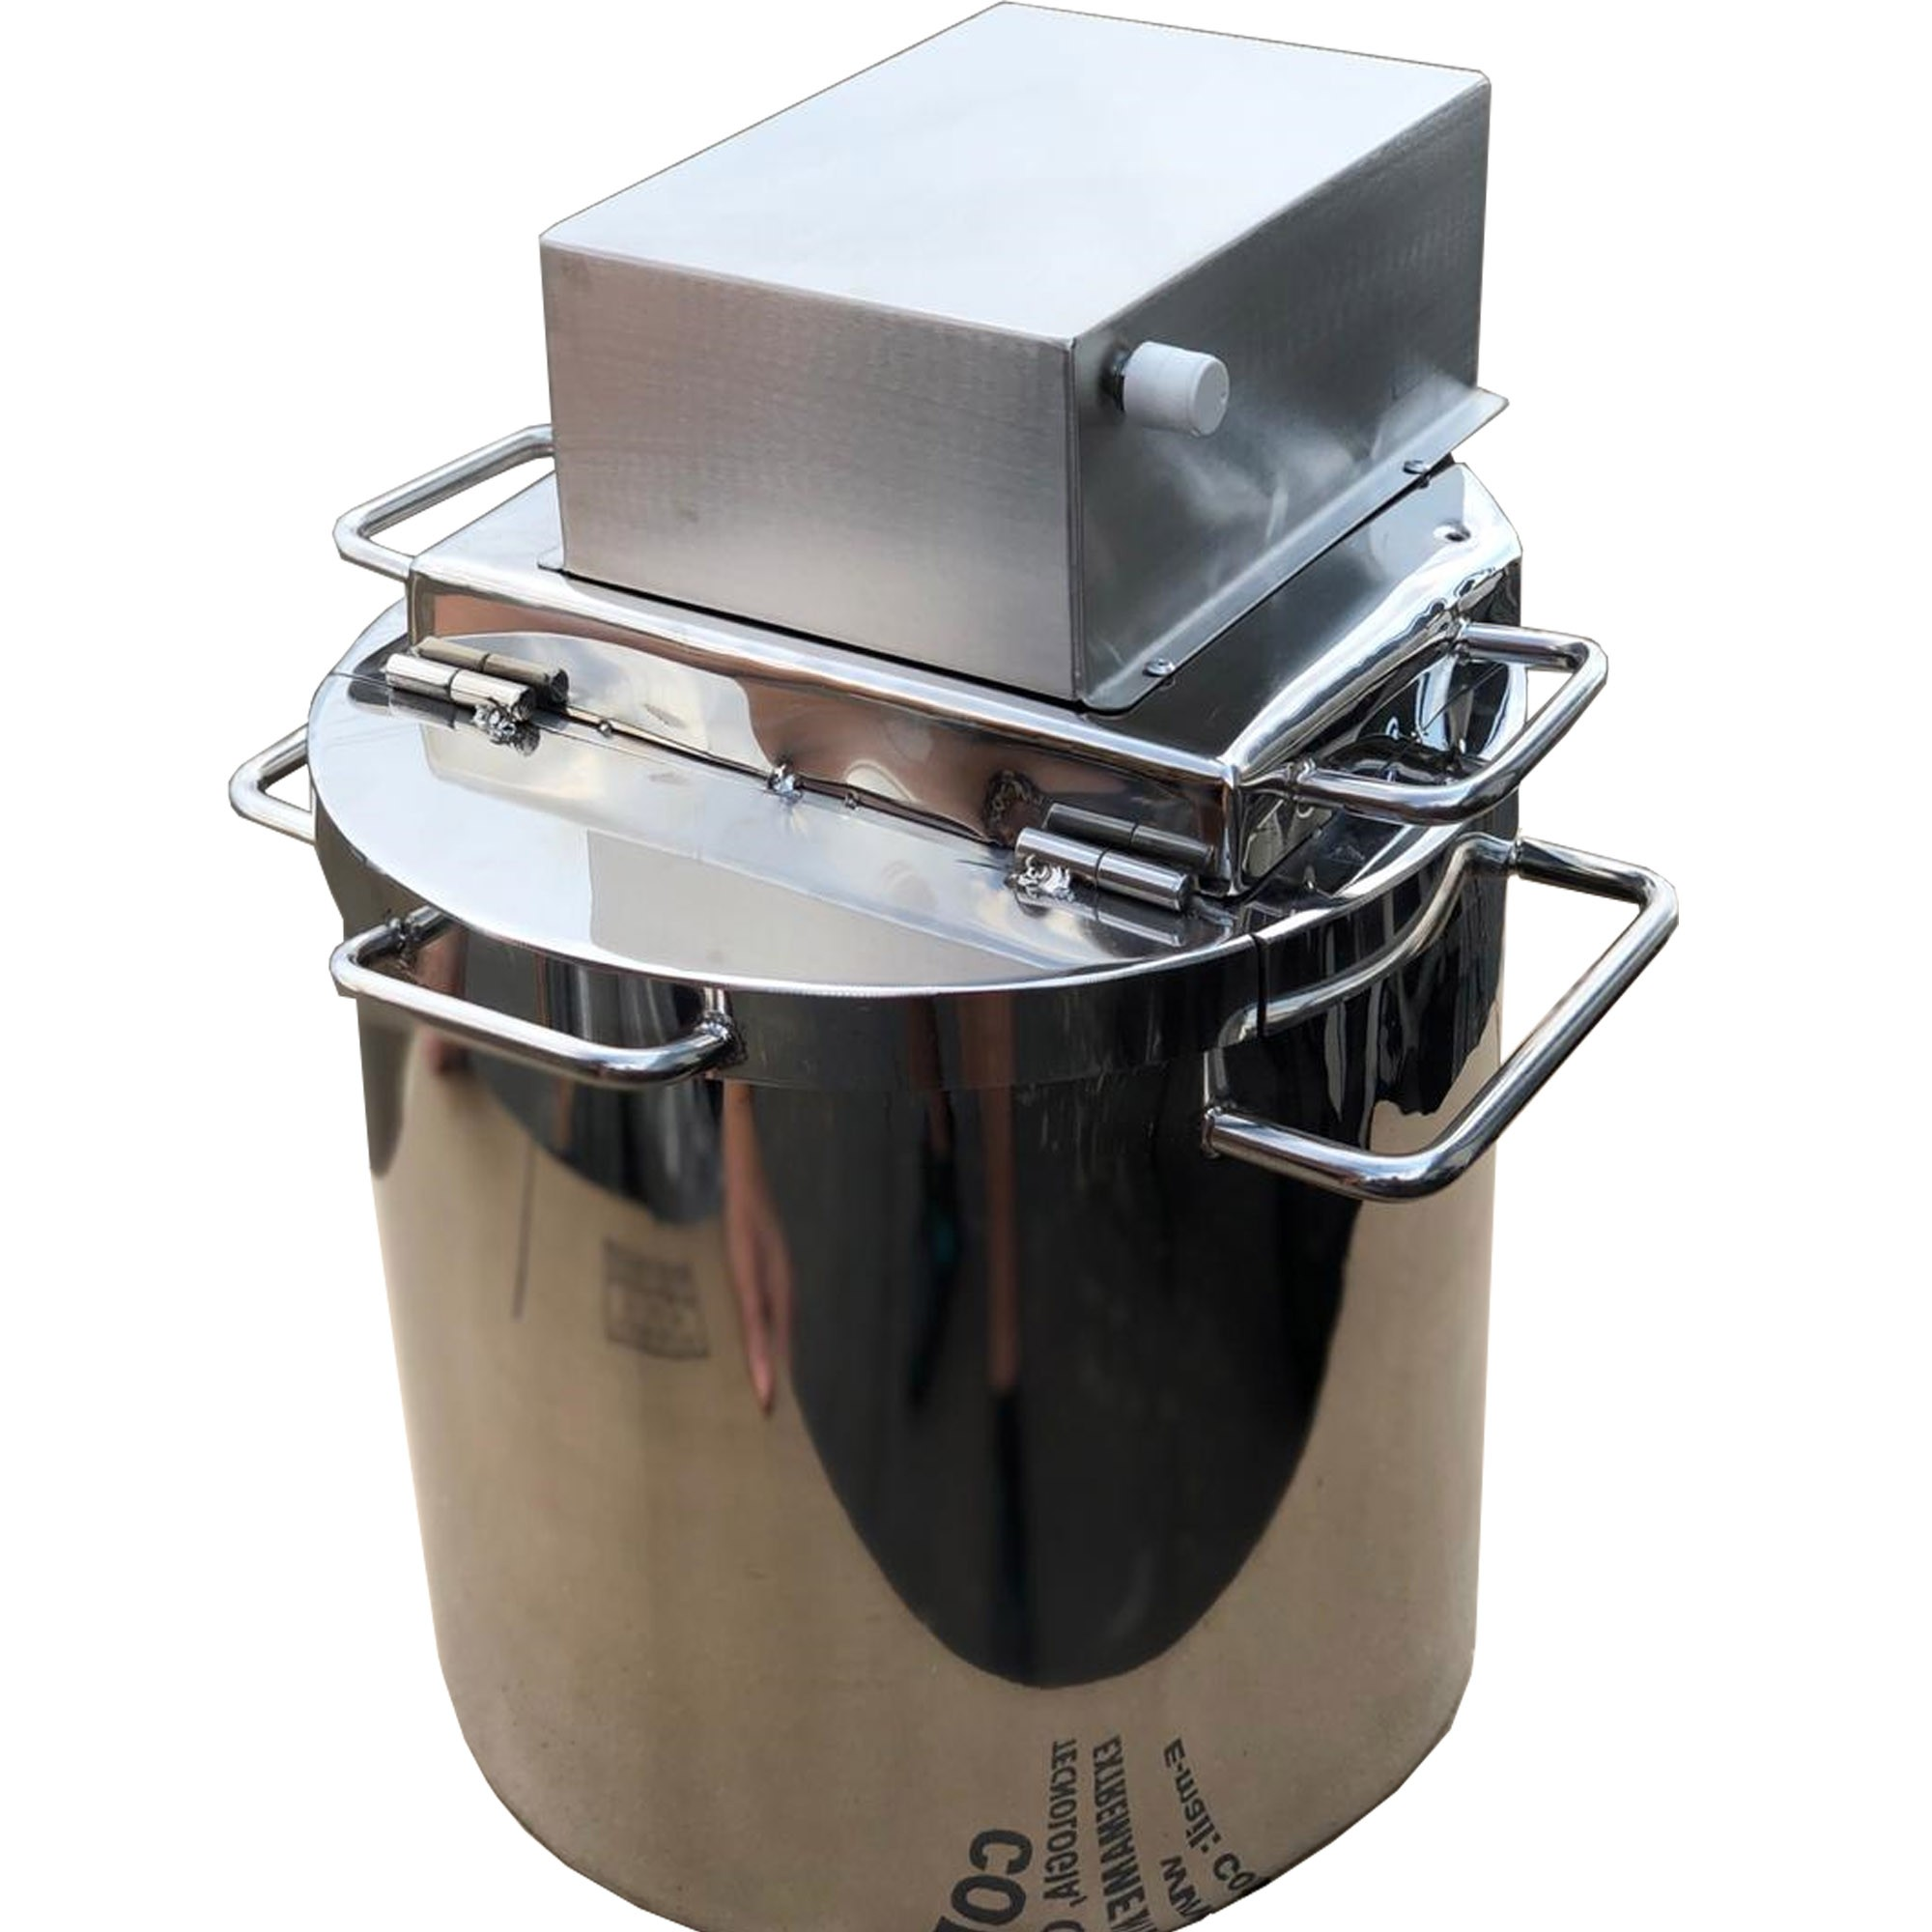 Pn555 Super Panela Industrial Para Polenta E Doces 26litros  - Controlpot Maquinas e Batedores Milk Shake e Furador de Côco